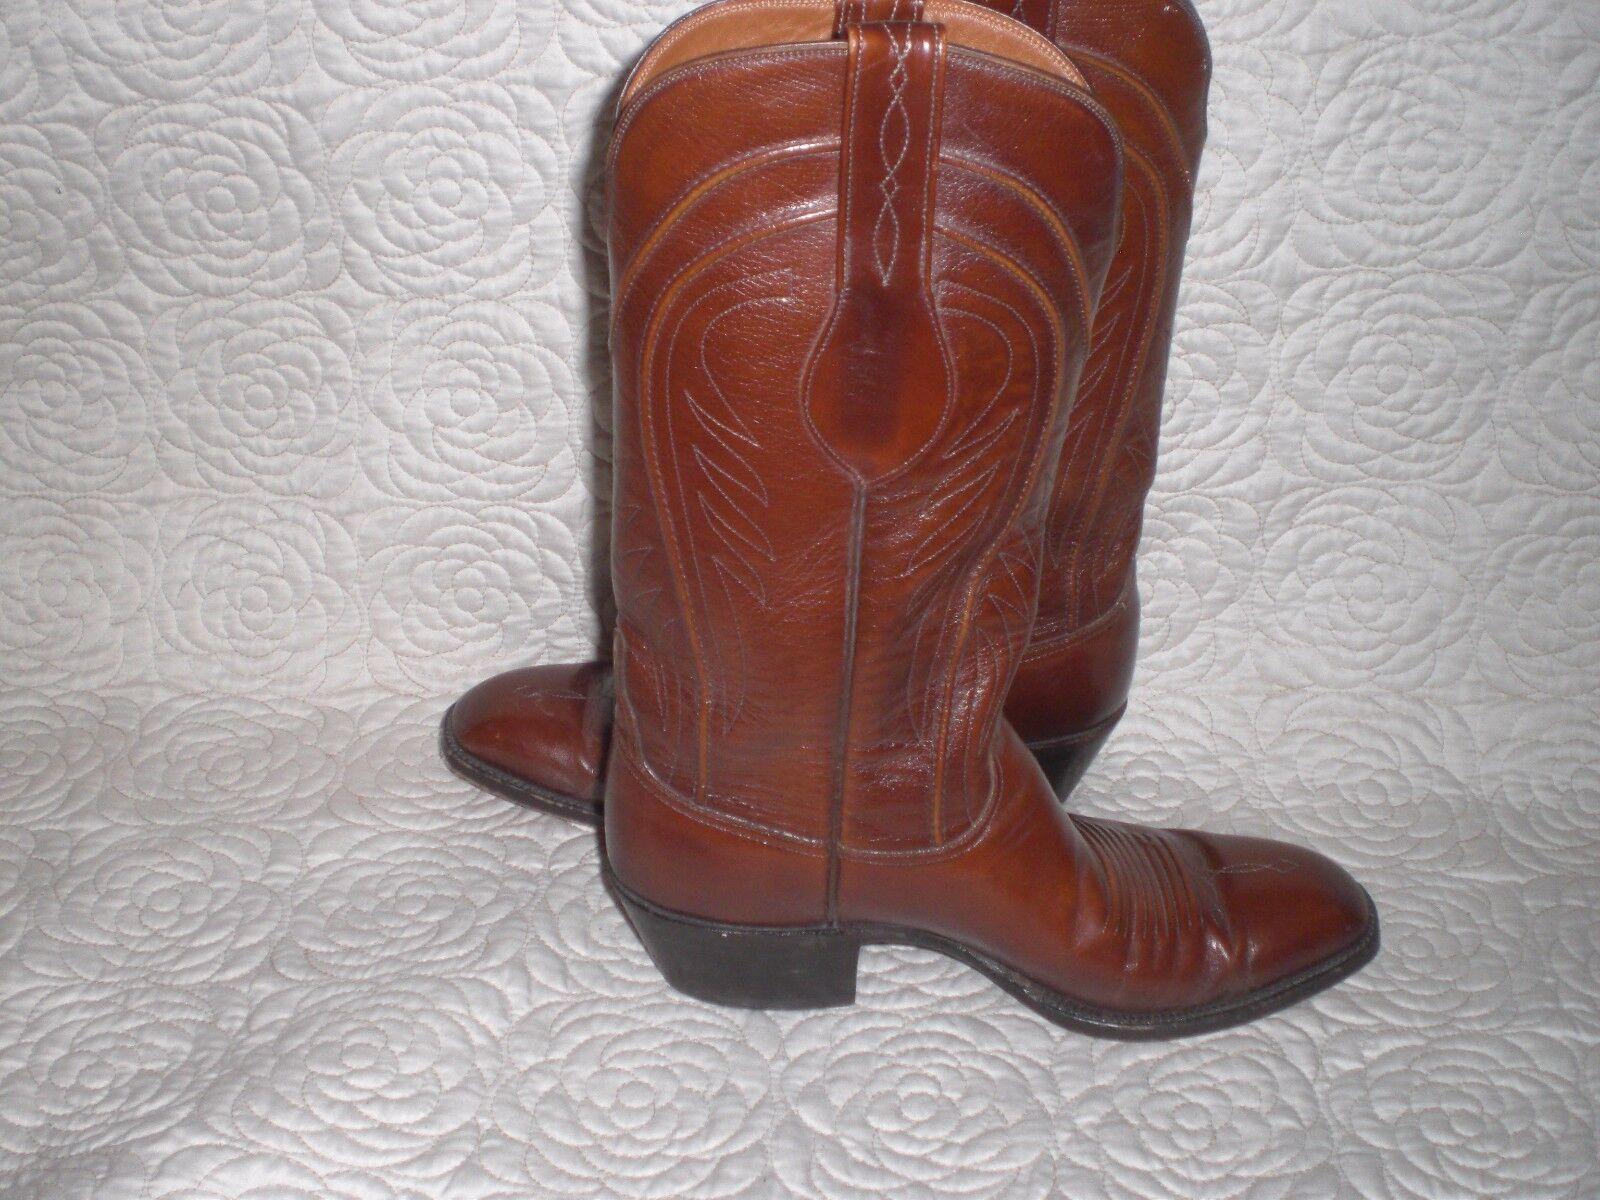 VINTAGE Lucchese L6609 L6609 L6609 Brown Western Cowboy GOAT LEATHER Stivali SIZE 8 D   895 0f85dd